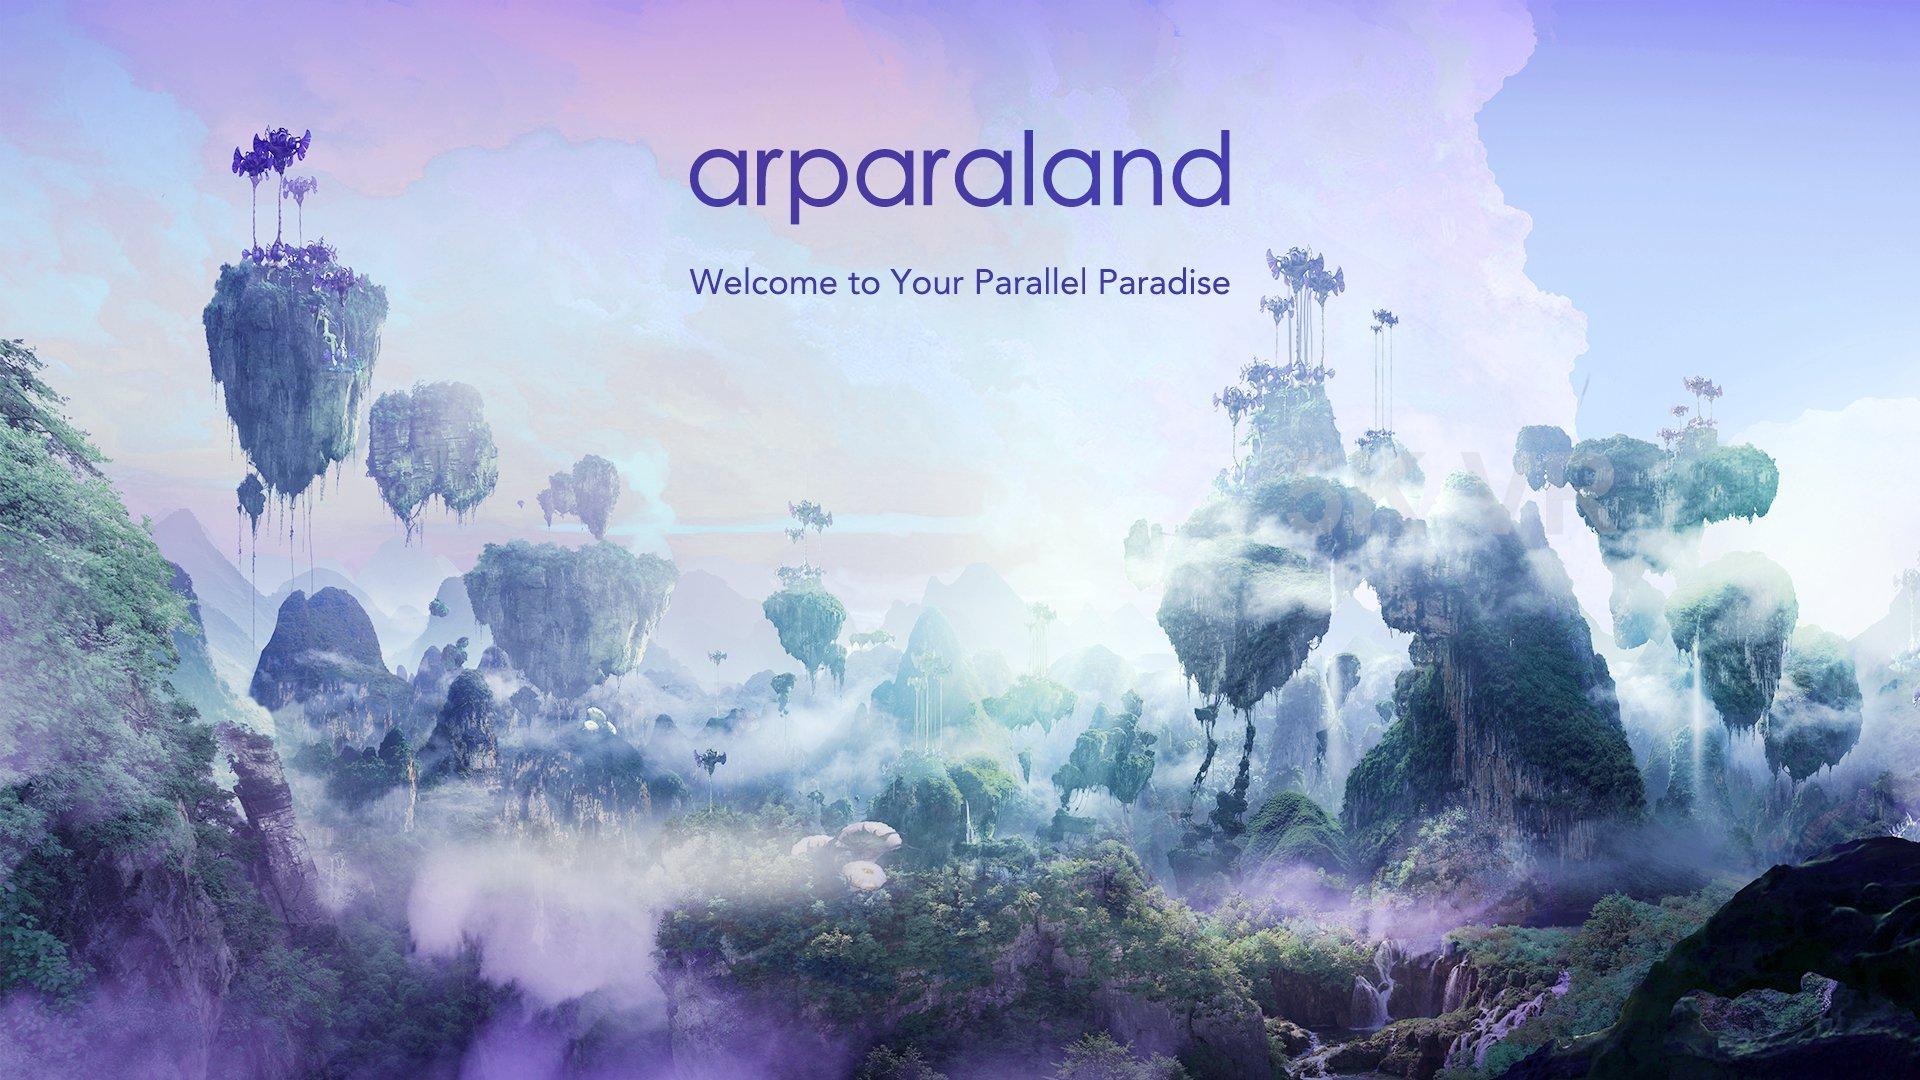 Arparaland